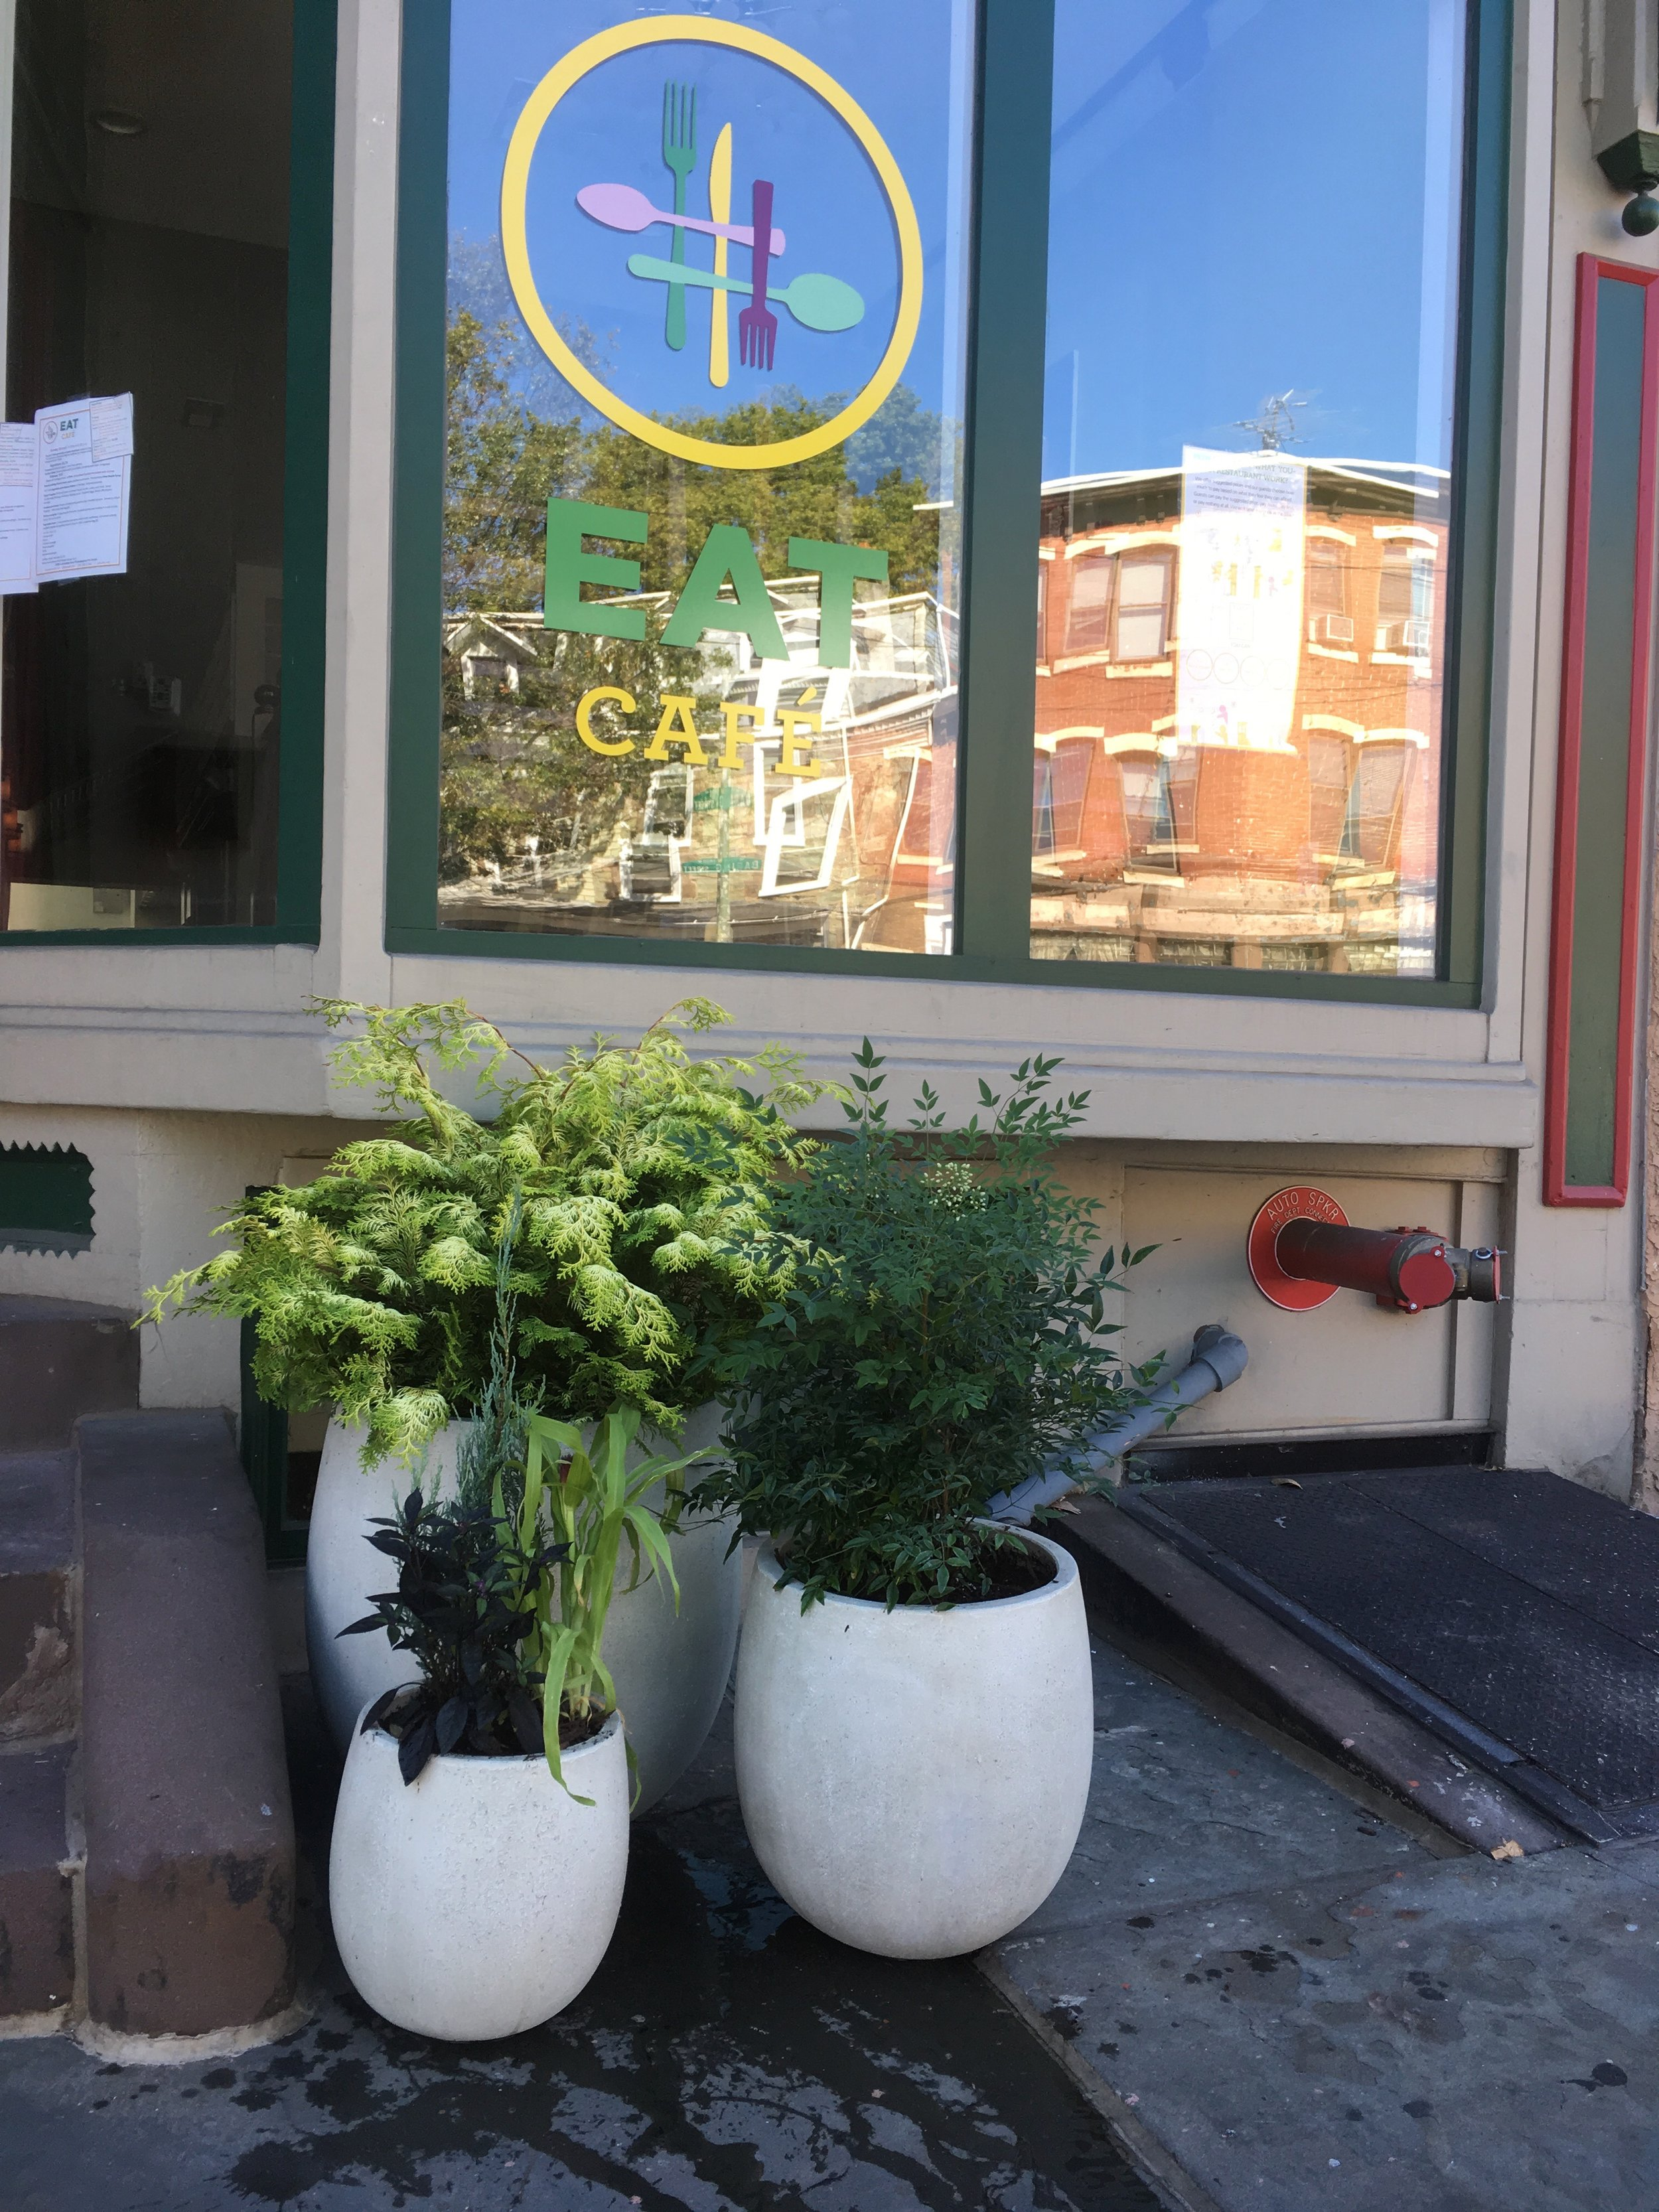 Eat Cafe, West Philadelphia